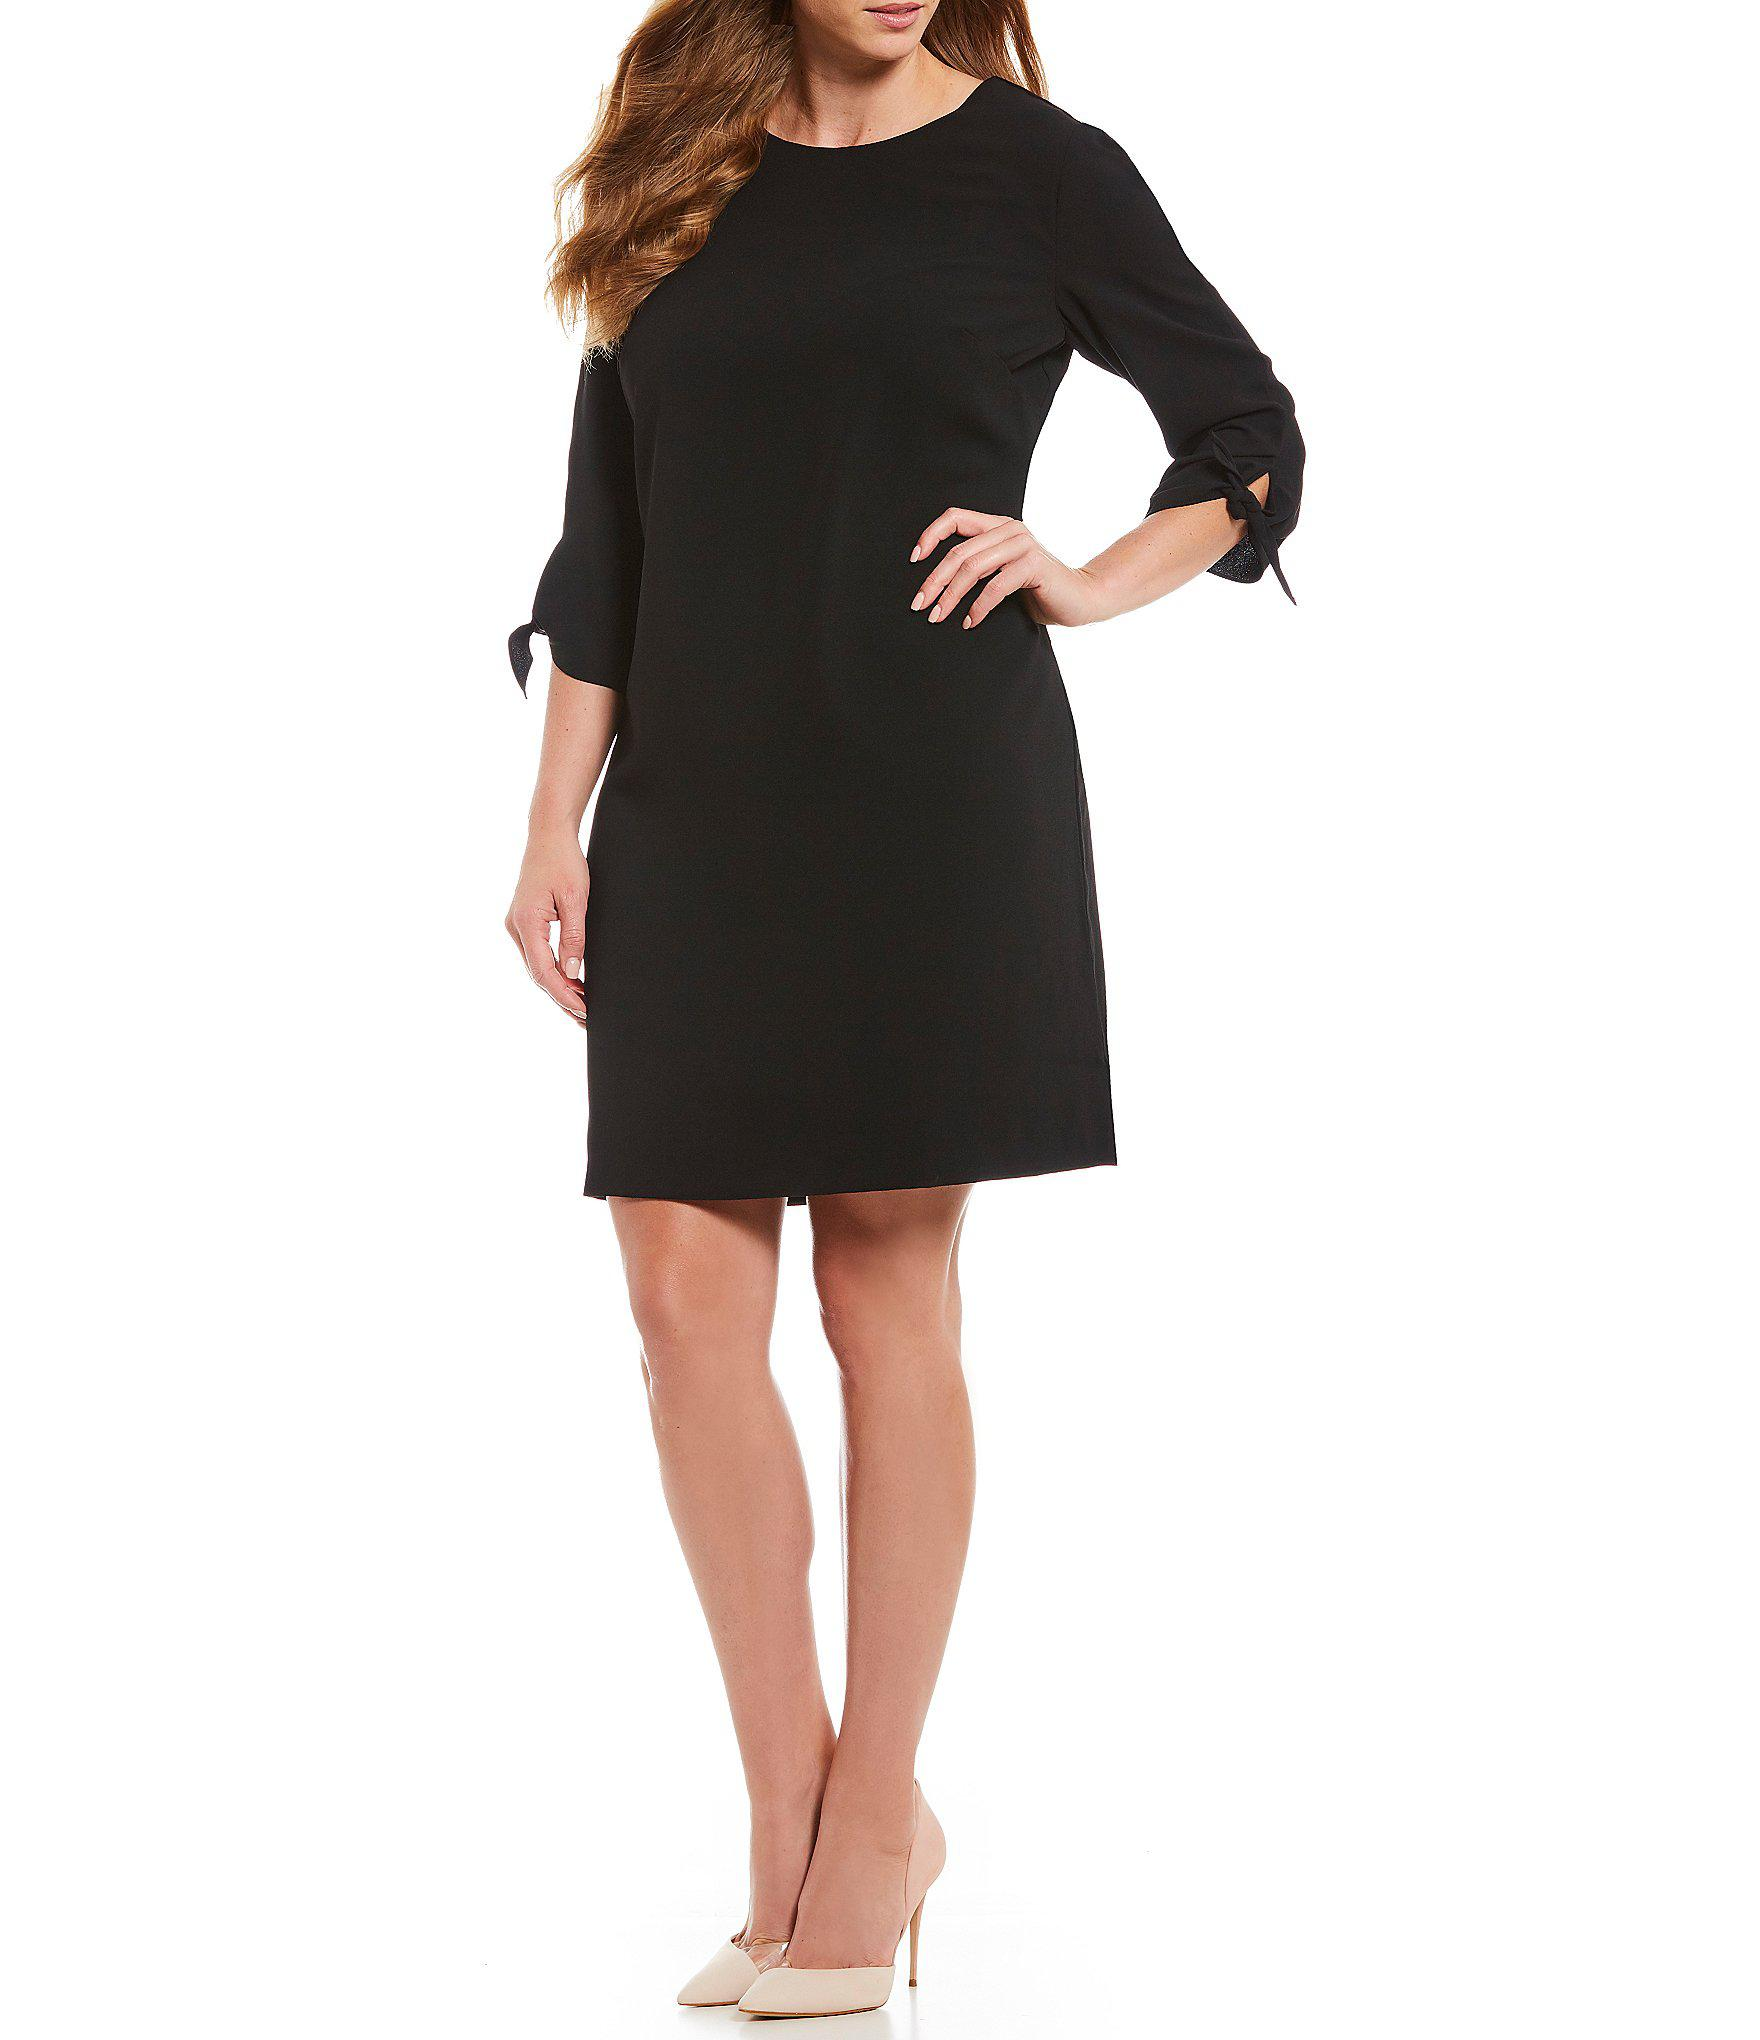 c4d8f092e54 Cece - Black Plus Size Tie Sleeve Shift Dress - Lyst. View fullscreen